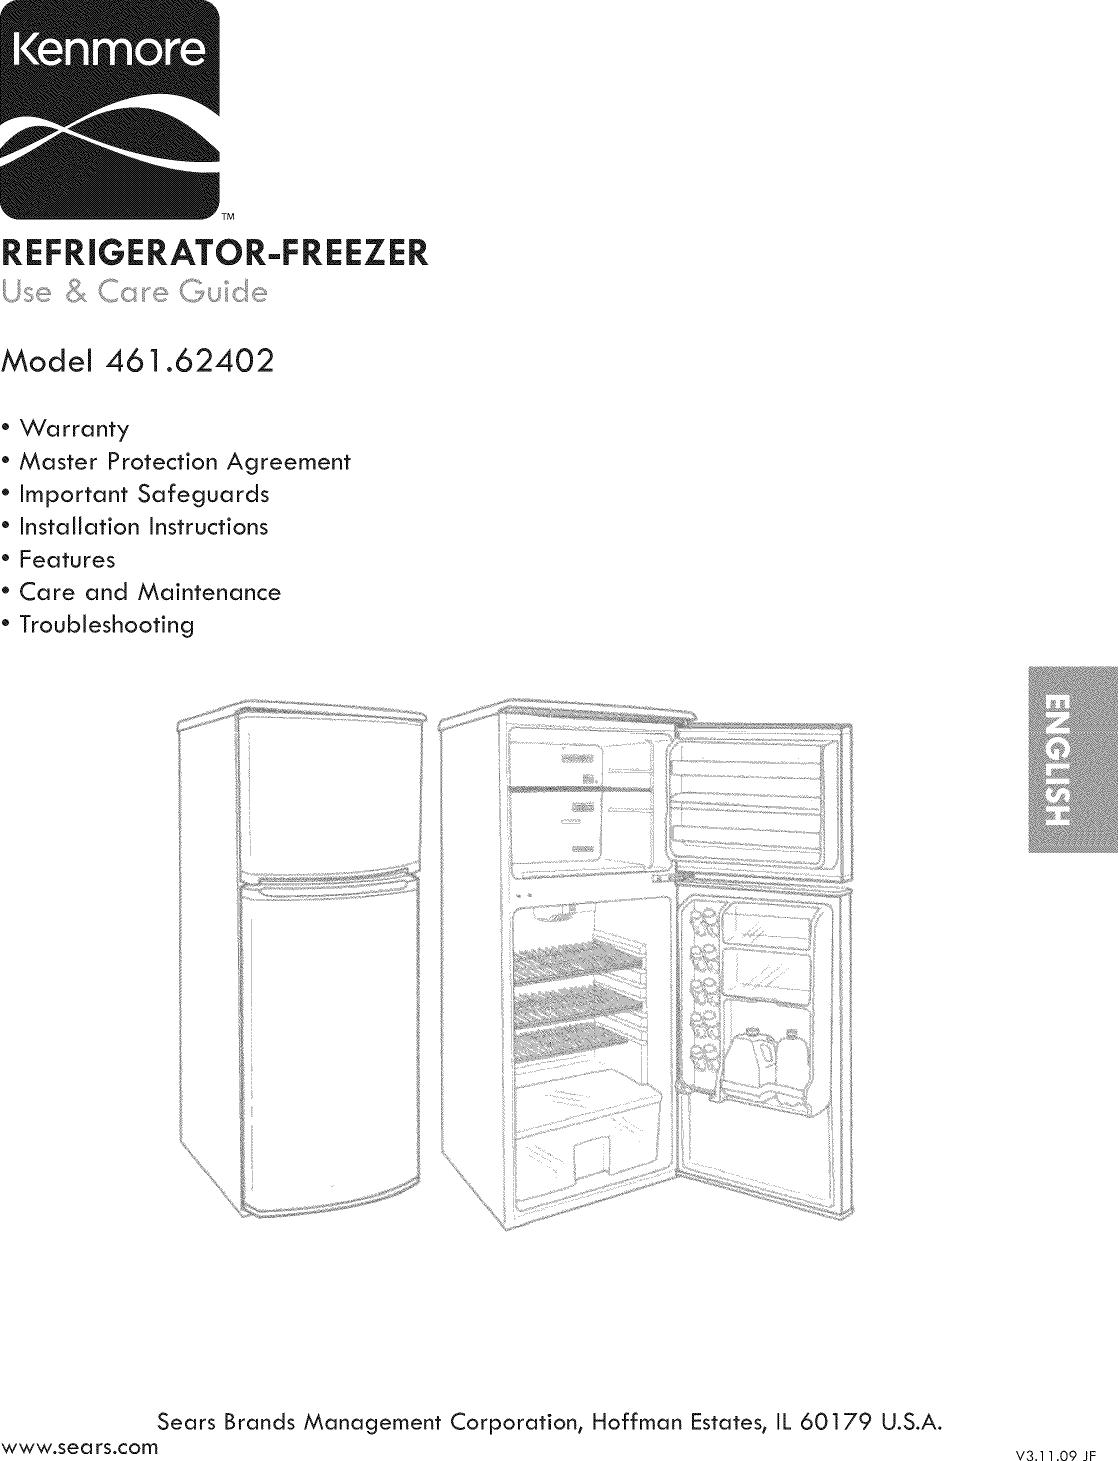 Kenmore 46162402010 User Manual COMPACT REFRIGERATOR